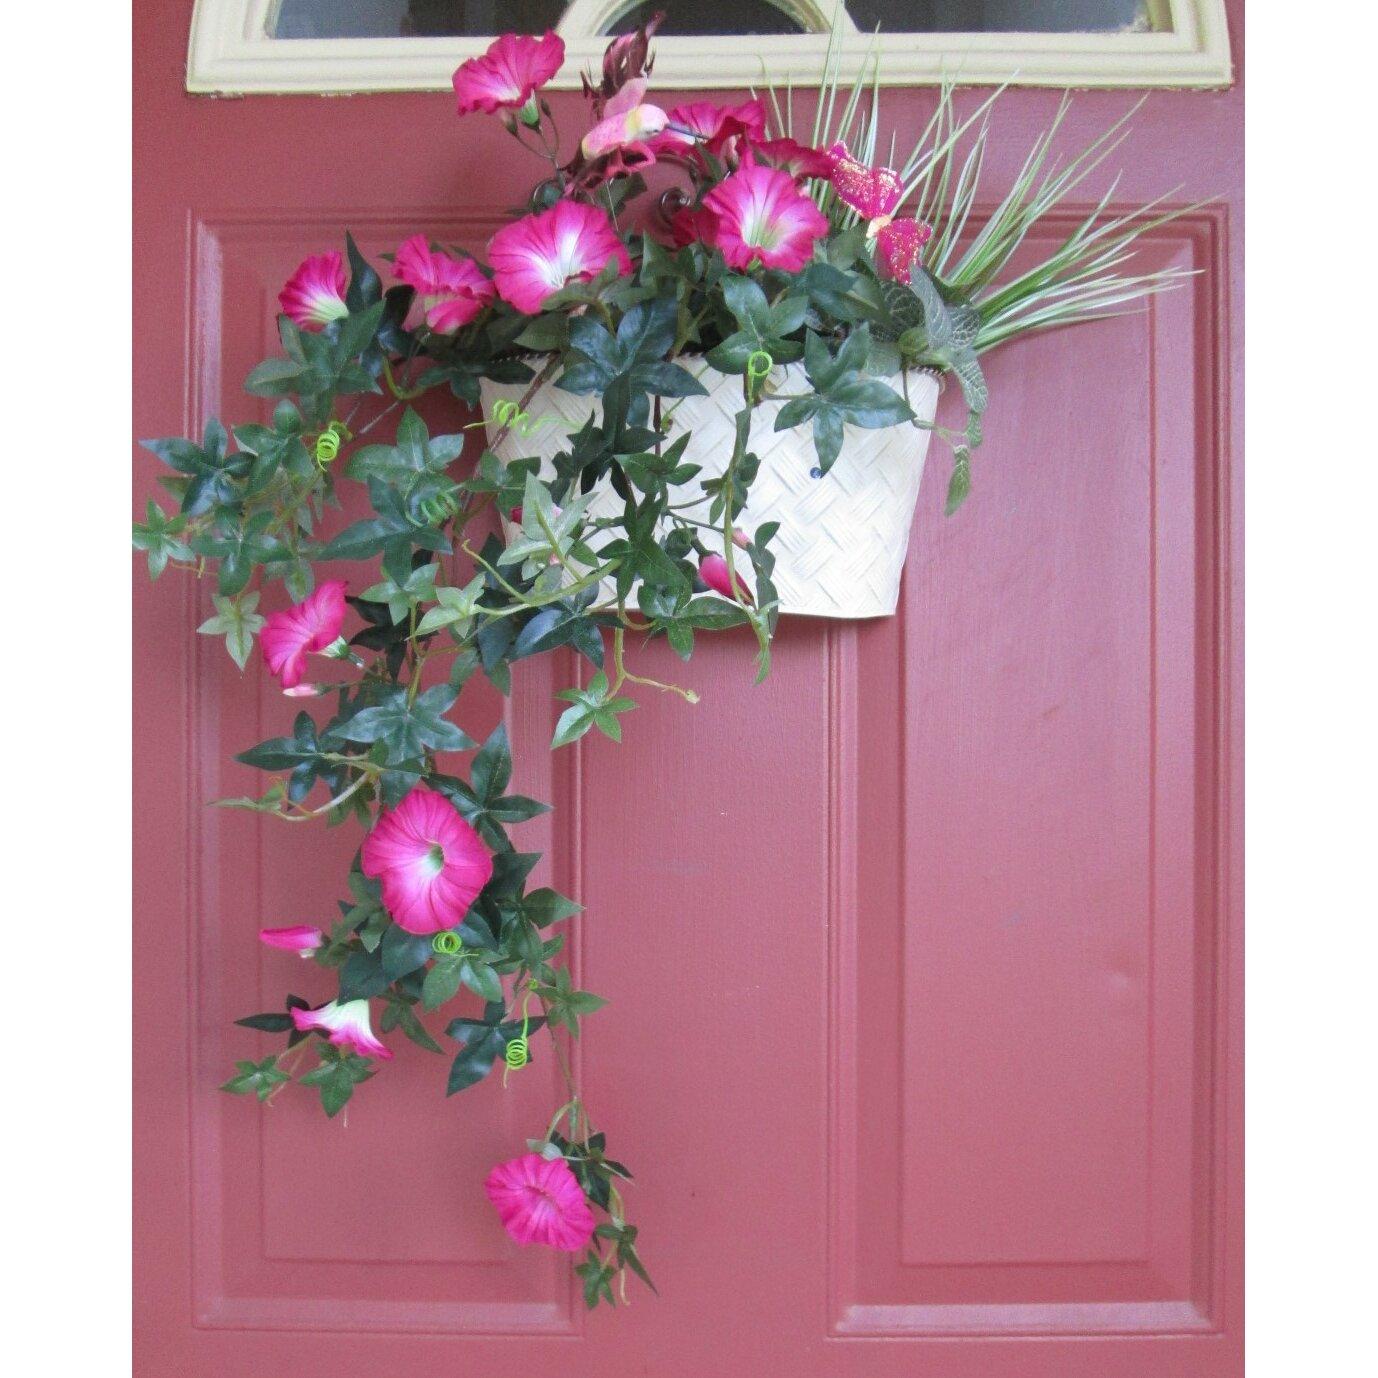 Silkmama September Birth Month Flower Morning Glory Beauty Arrangement &